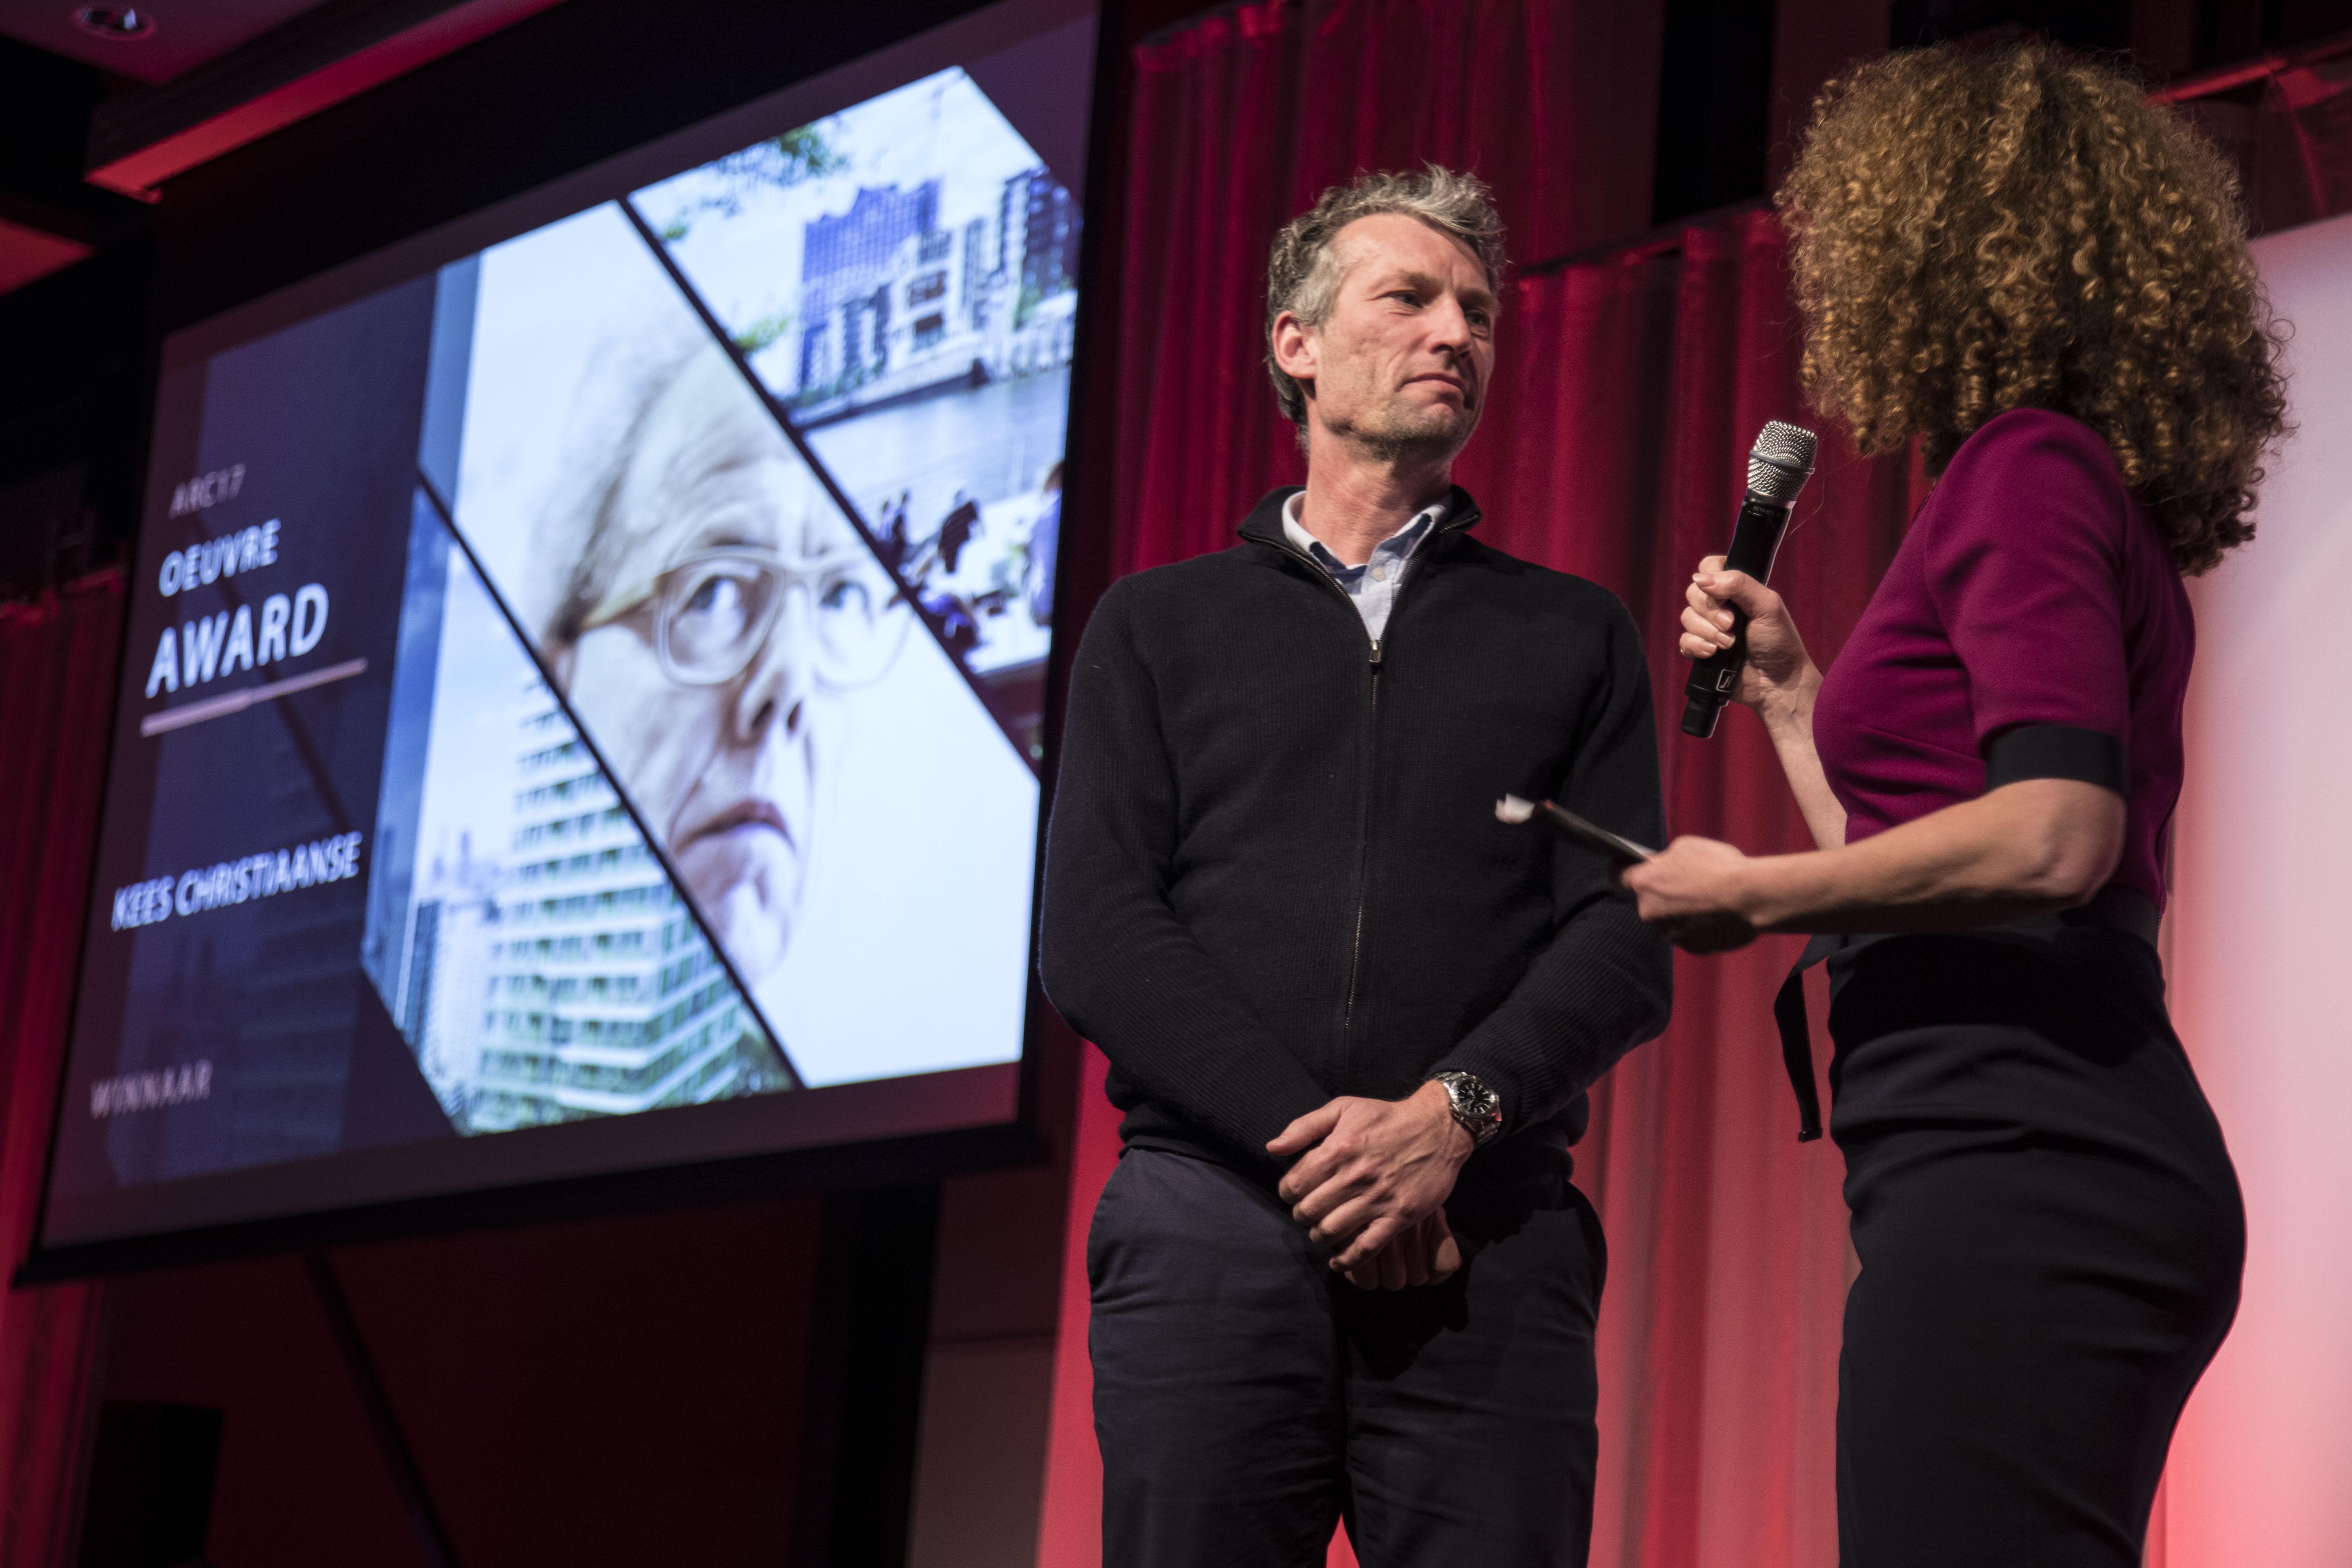 <p>Juryvoorzitter van de ARC17 Oeuvre Award: Patrick Klooster. Foto: Elvins Fotografie</p>